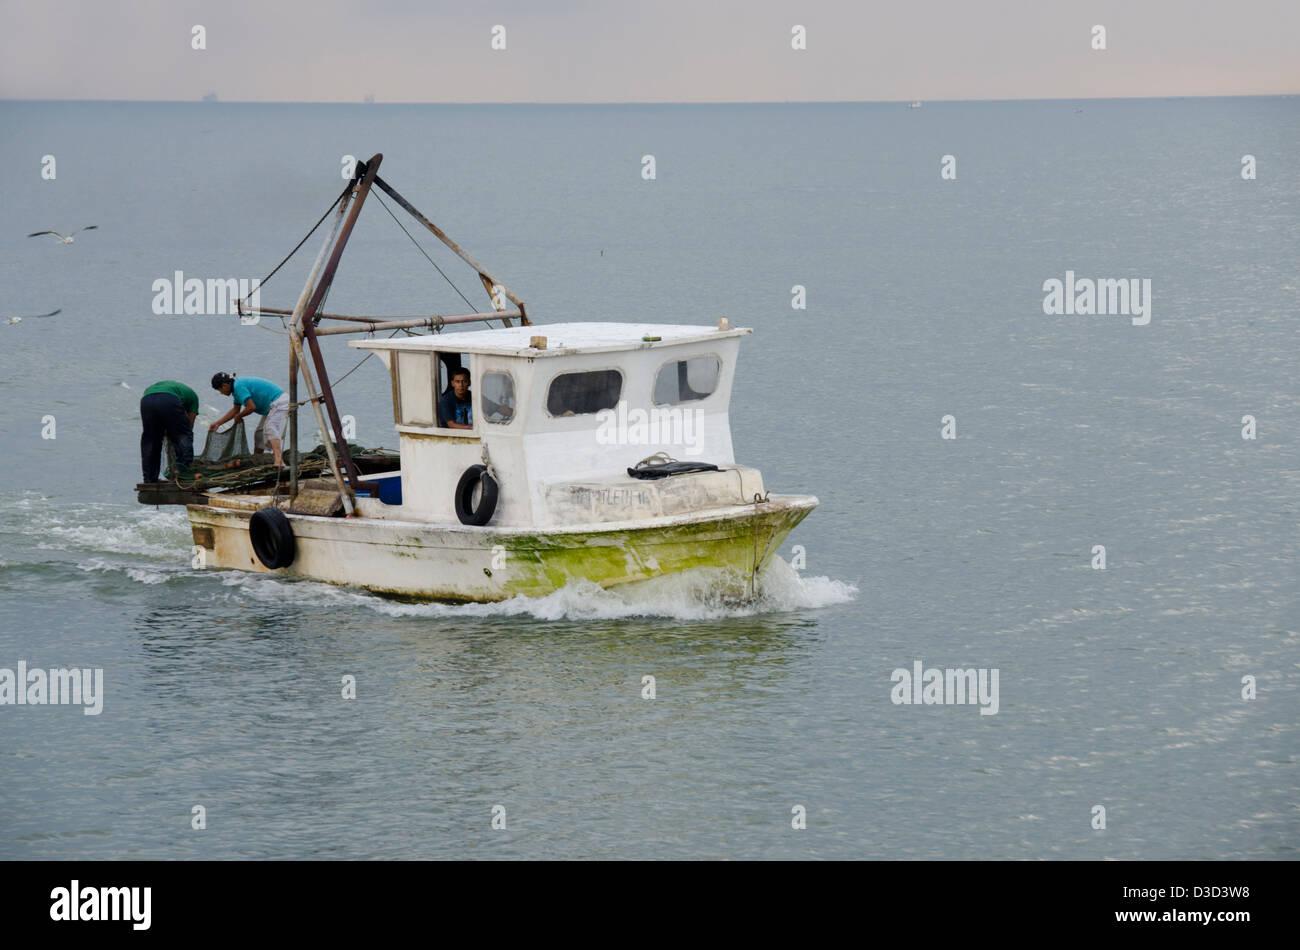 Guatemala, Rio Dulce, Livingston. Early morning local fishing boat. - Stock Image